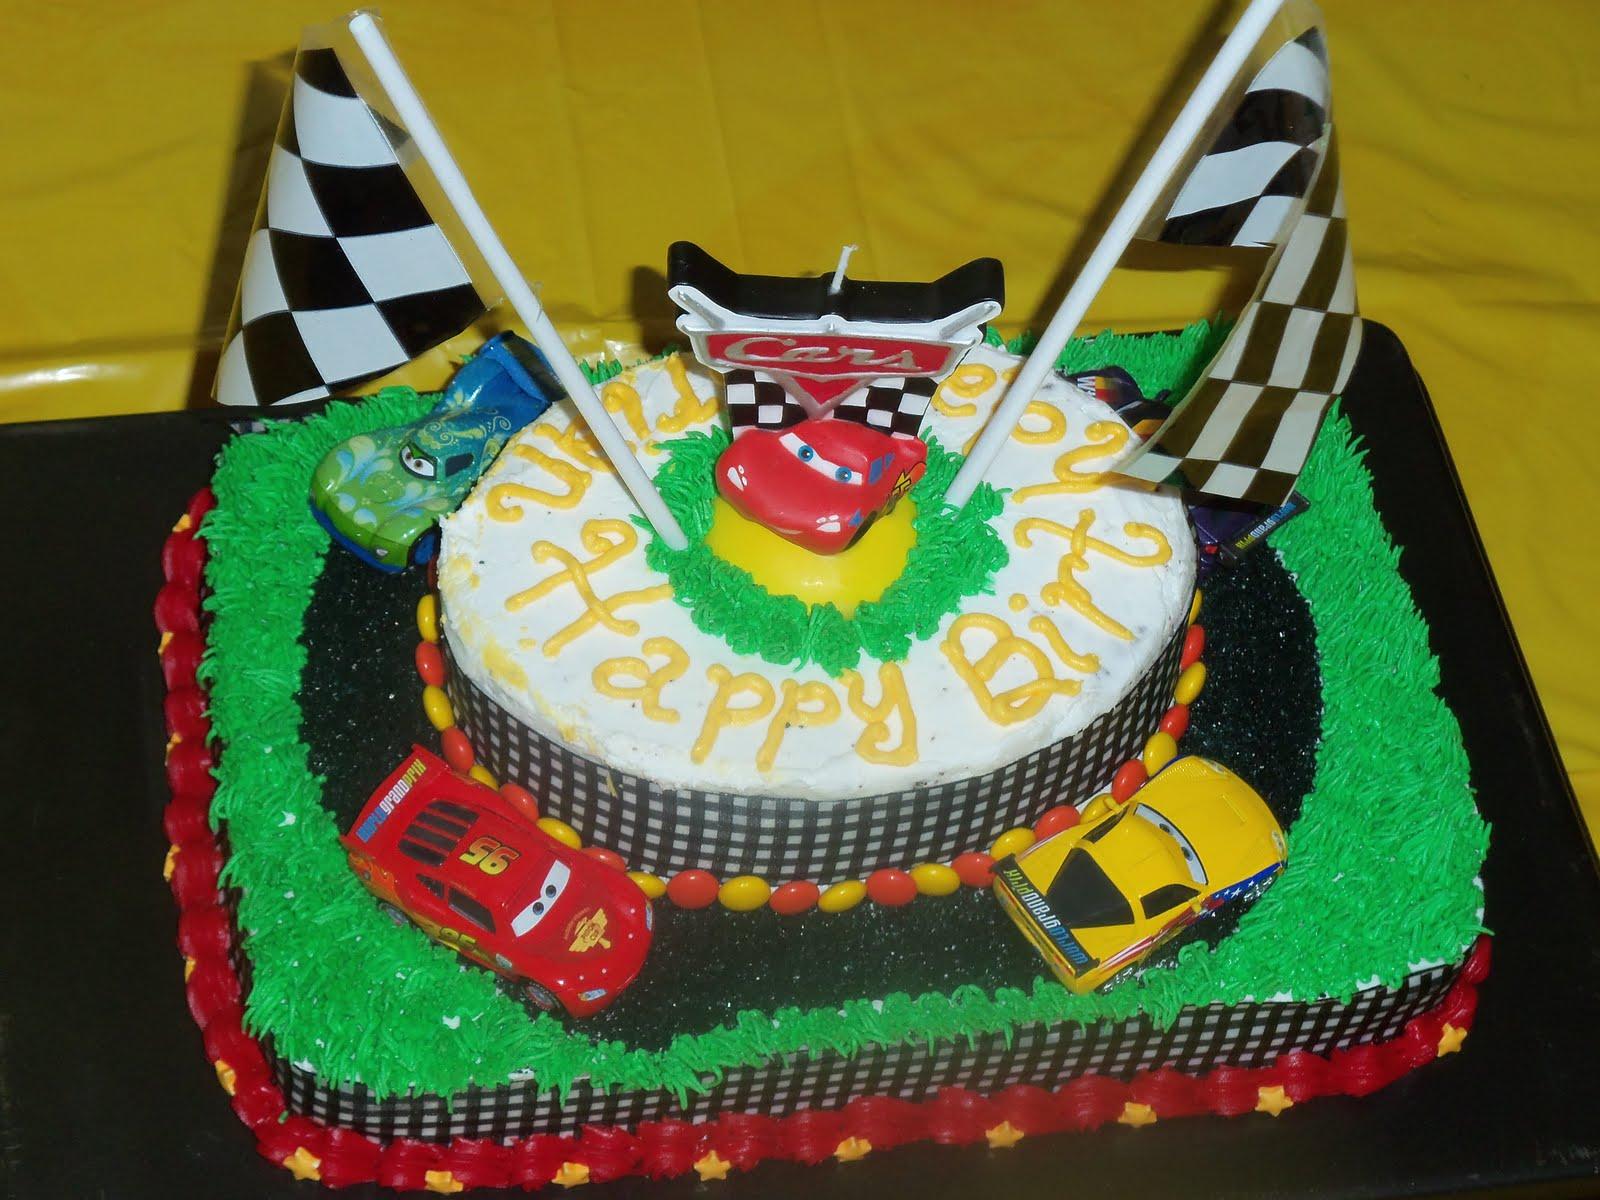 Disney Cars Birthday Cake: My Charming Cakes: Pixar Cars Cake